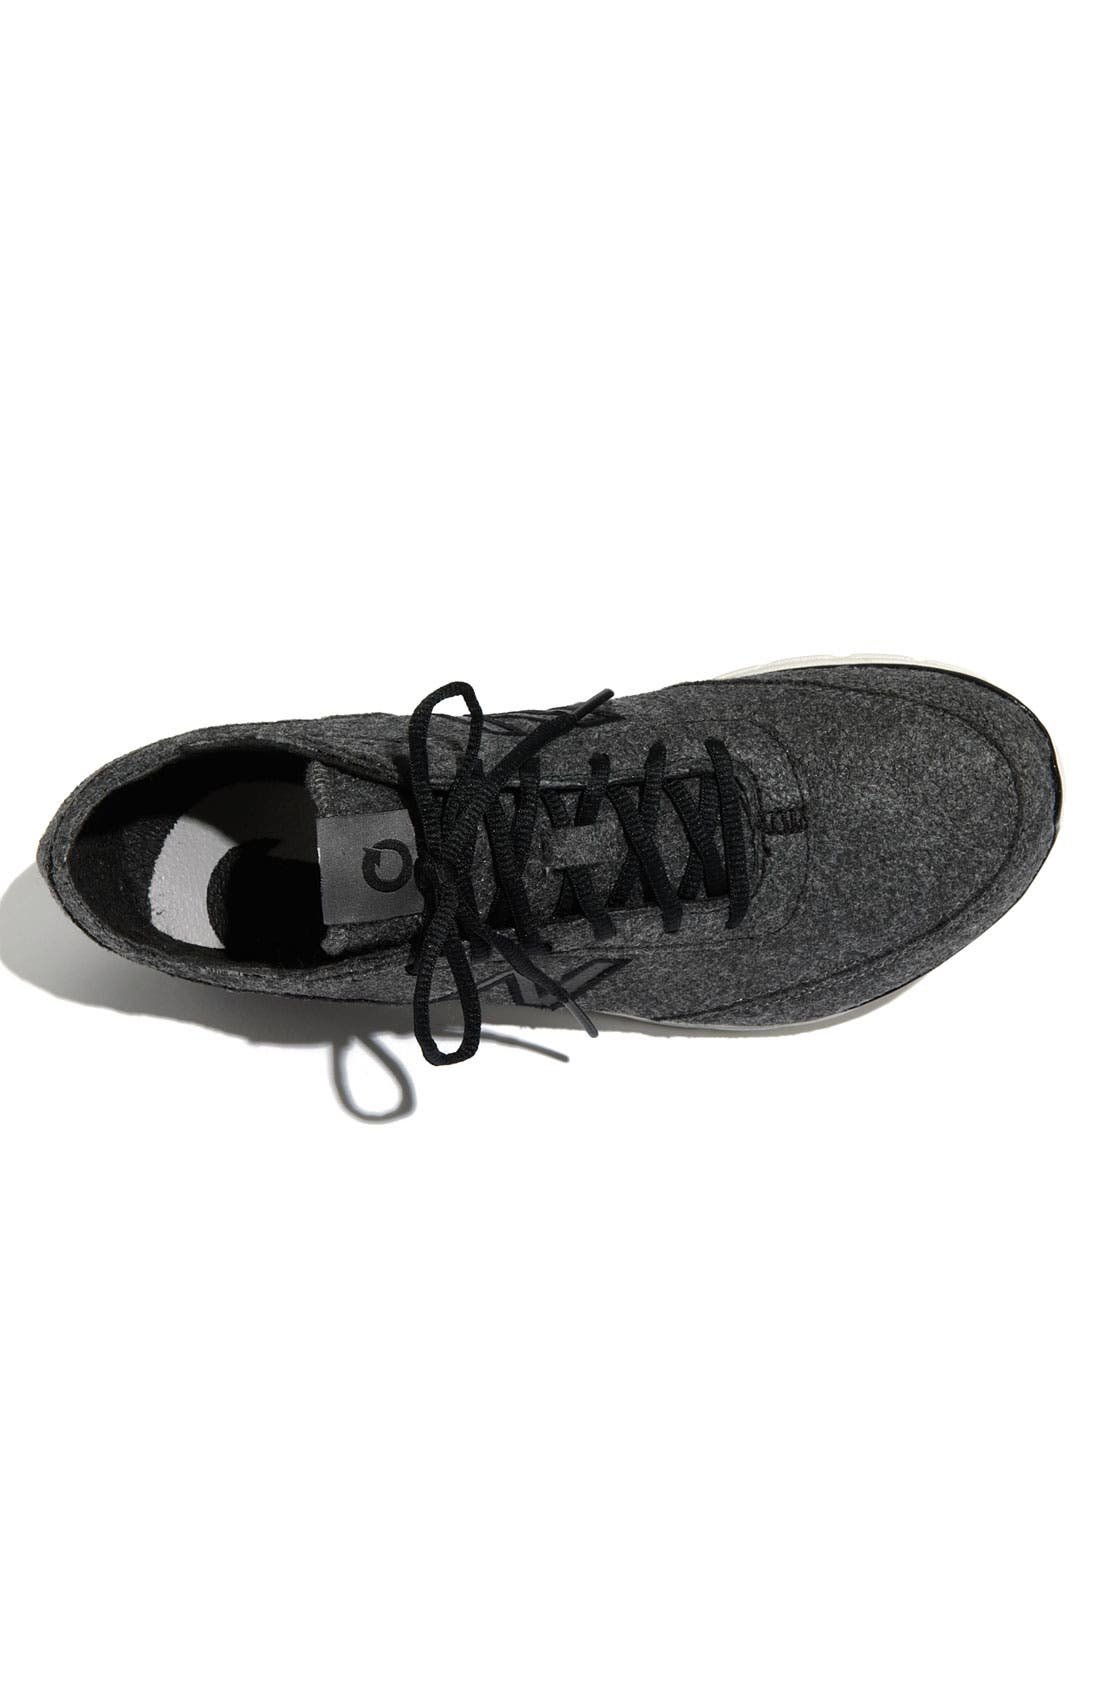 Alternate Image 2  - New Balance 'newSKY' Sneaker (Men)